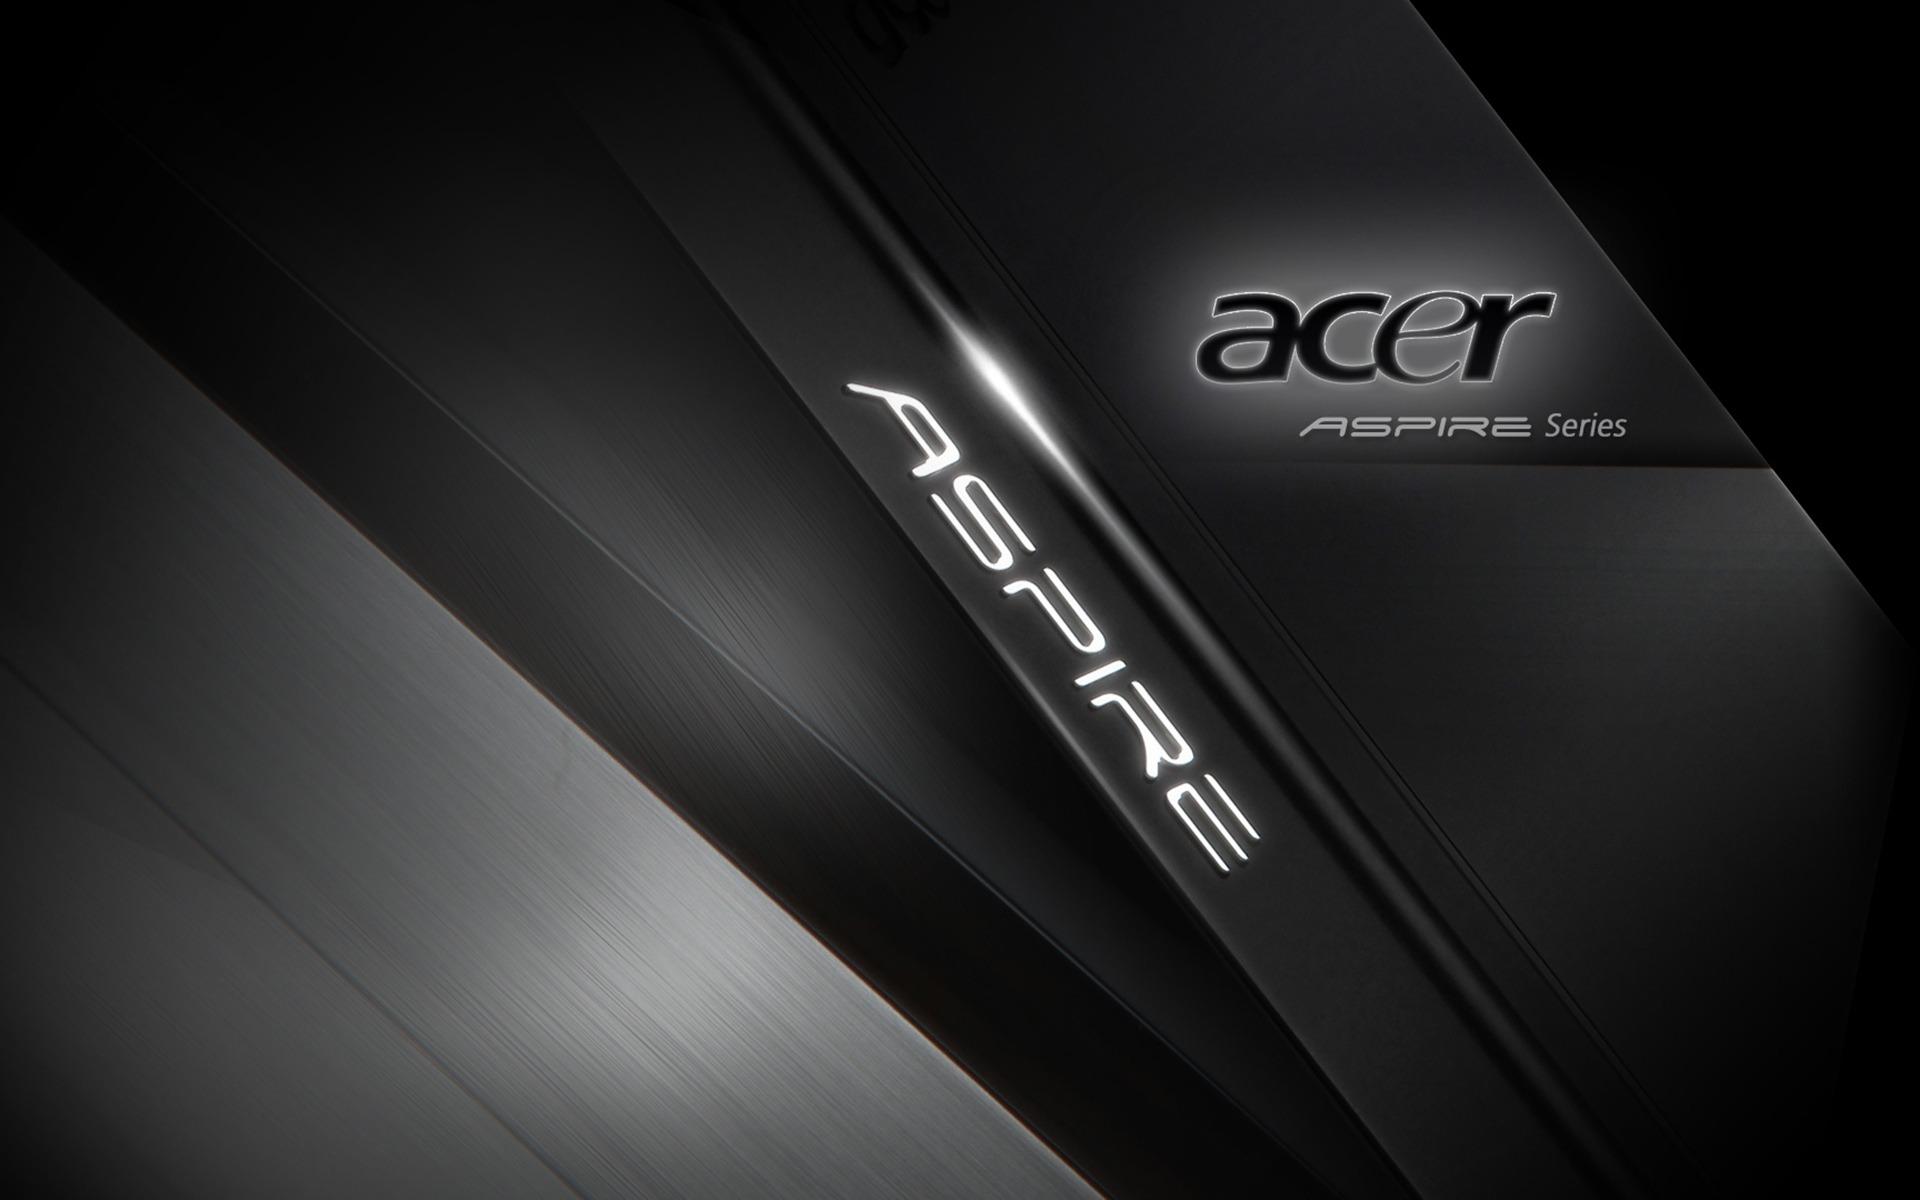 acer-aspire-1920-1200-7618